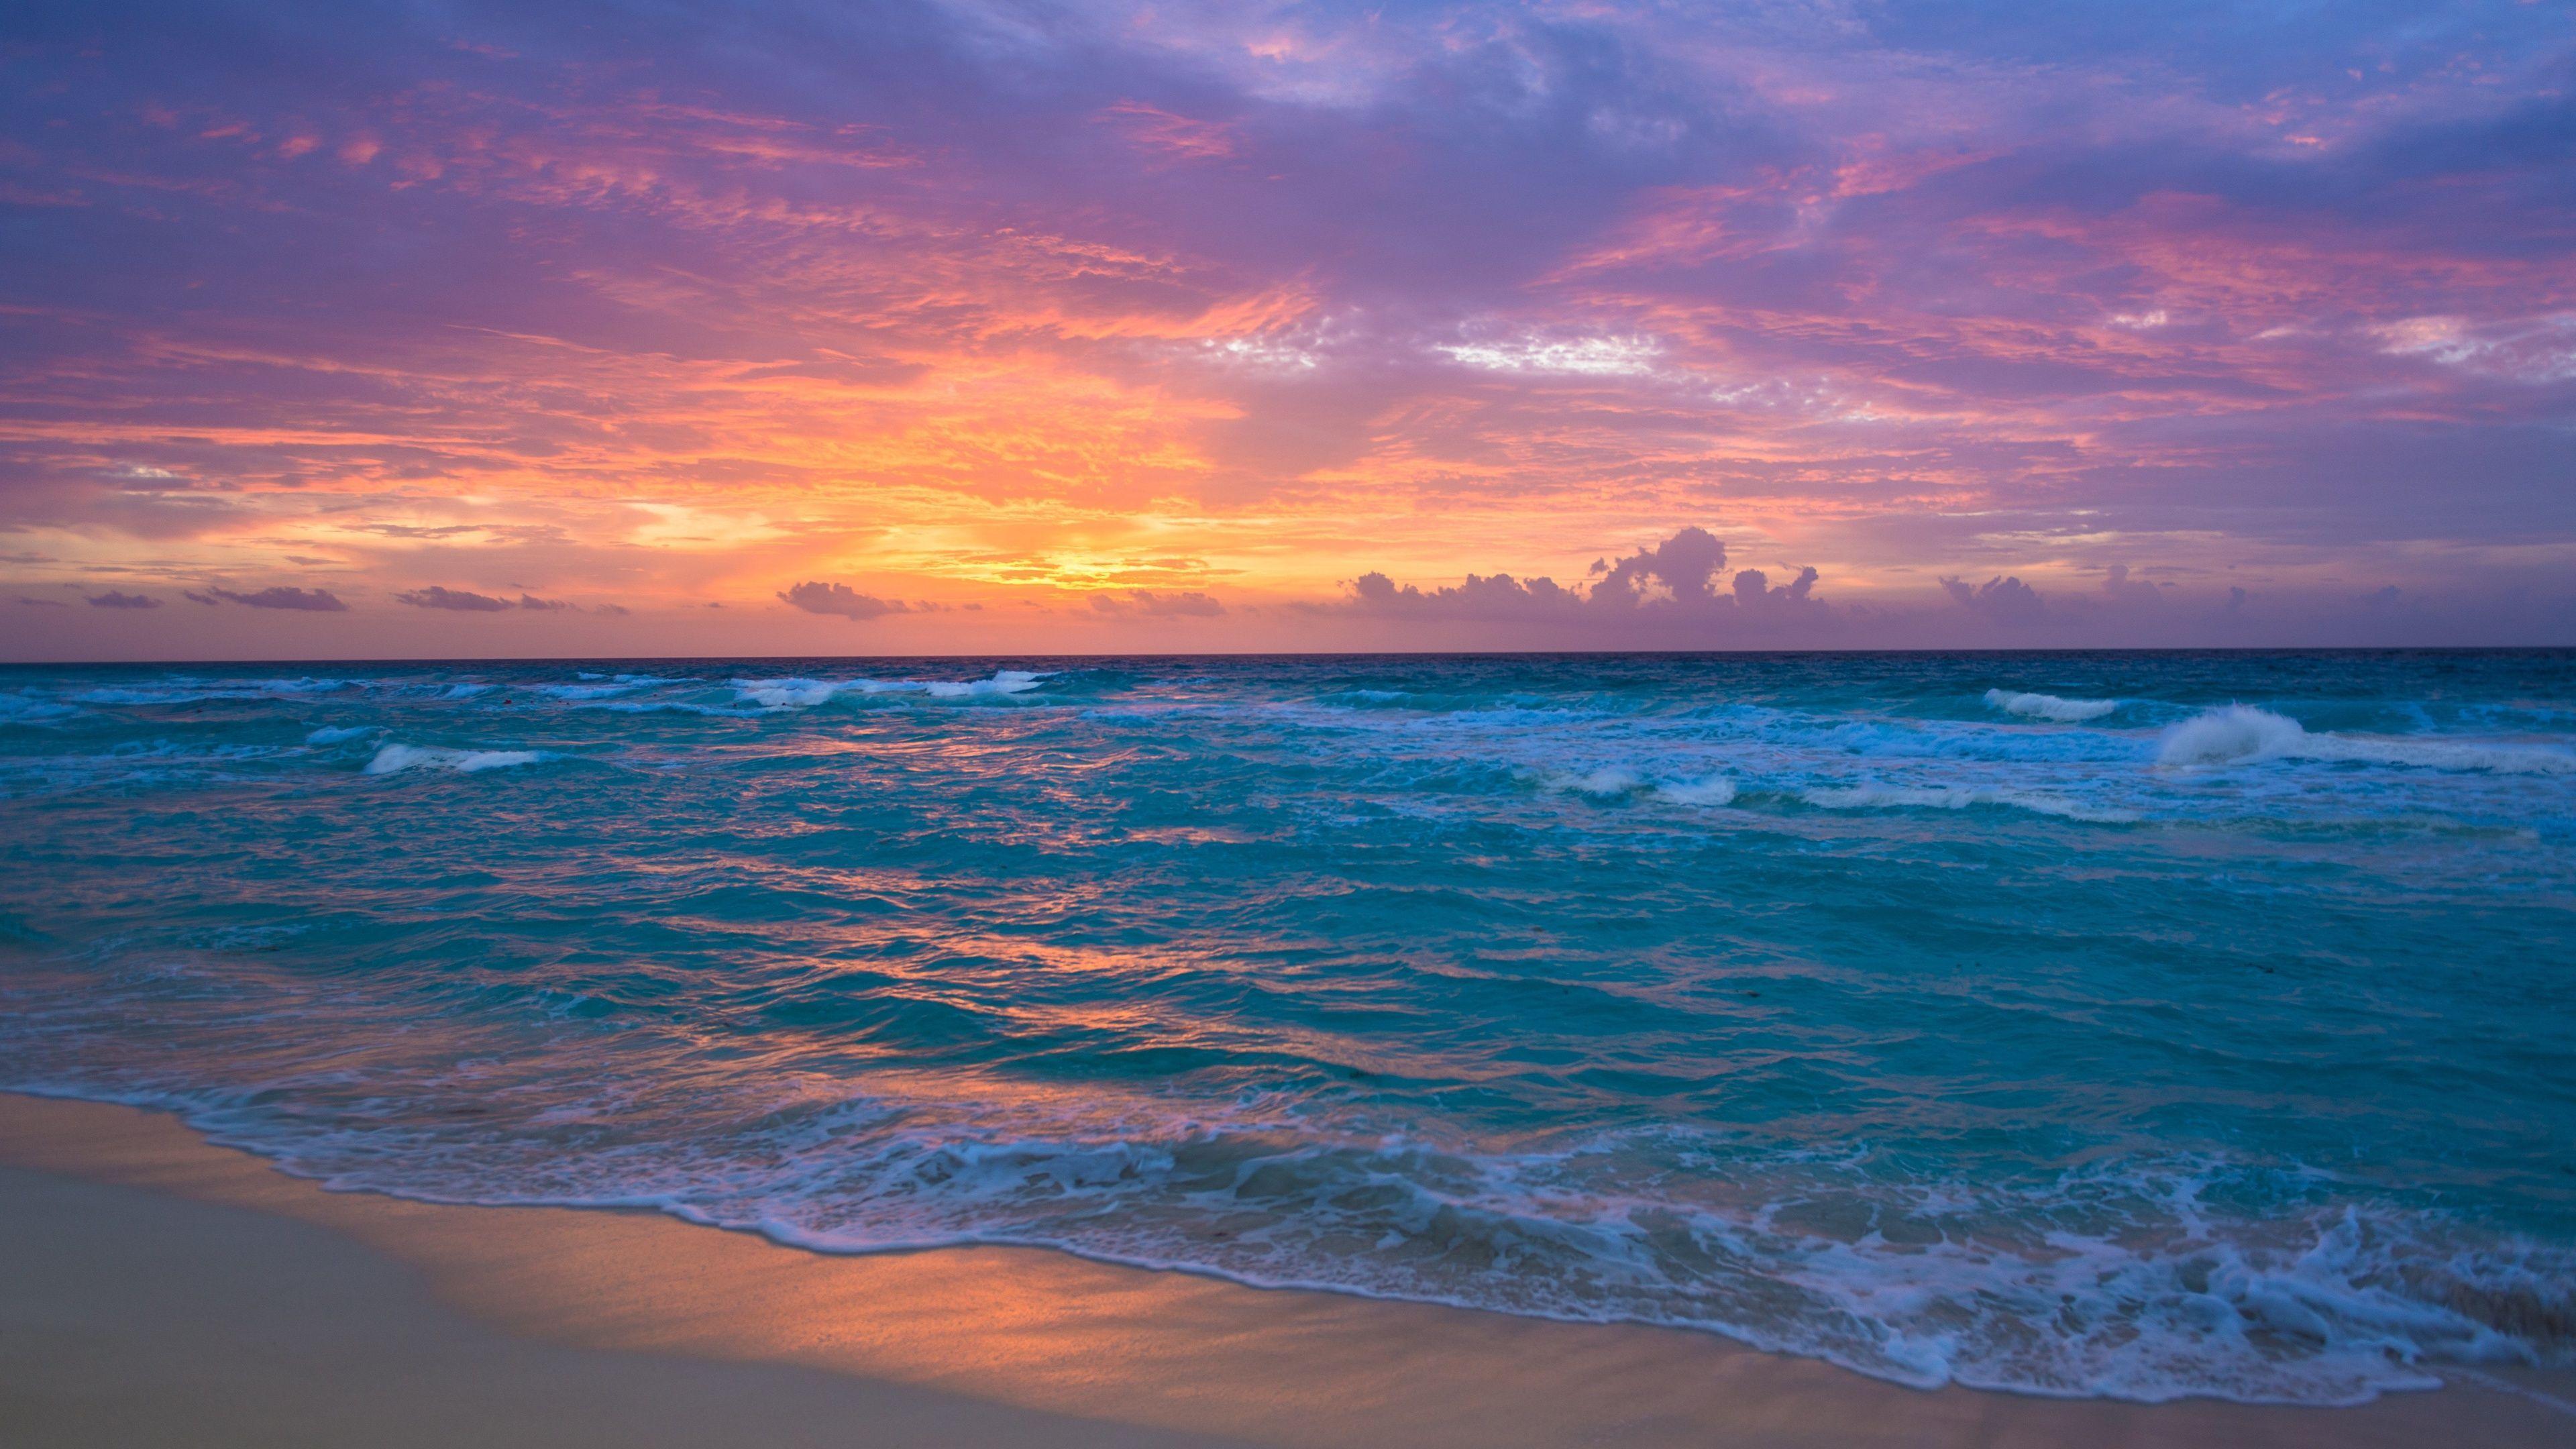 4k Ultra Hd Ocean Wallpapers Top Free 4k Ultra Hd Ocean Backgrounds Wallpaperaccess